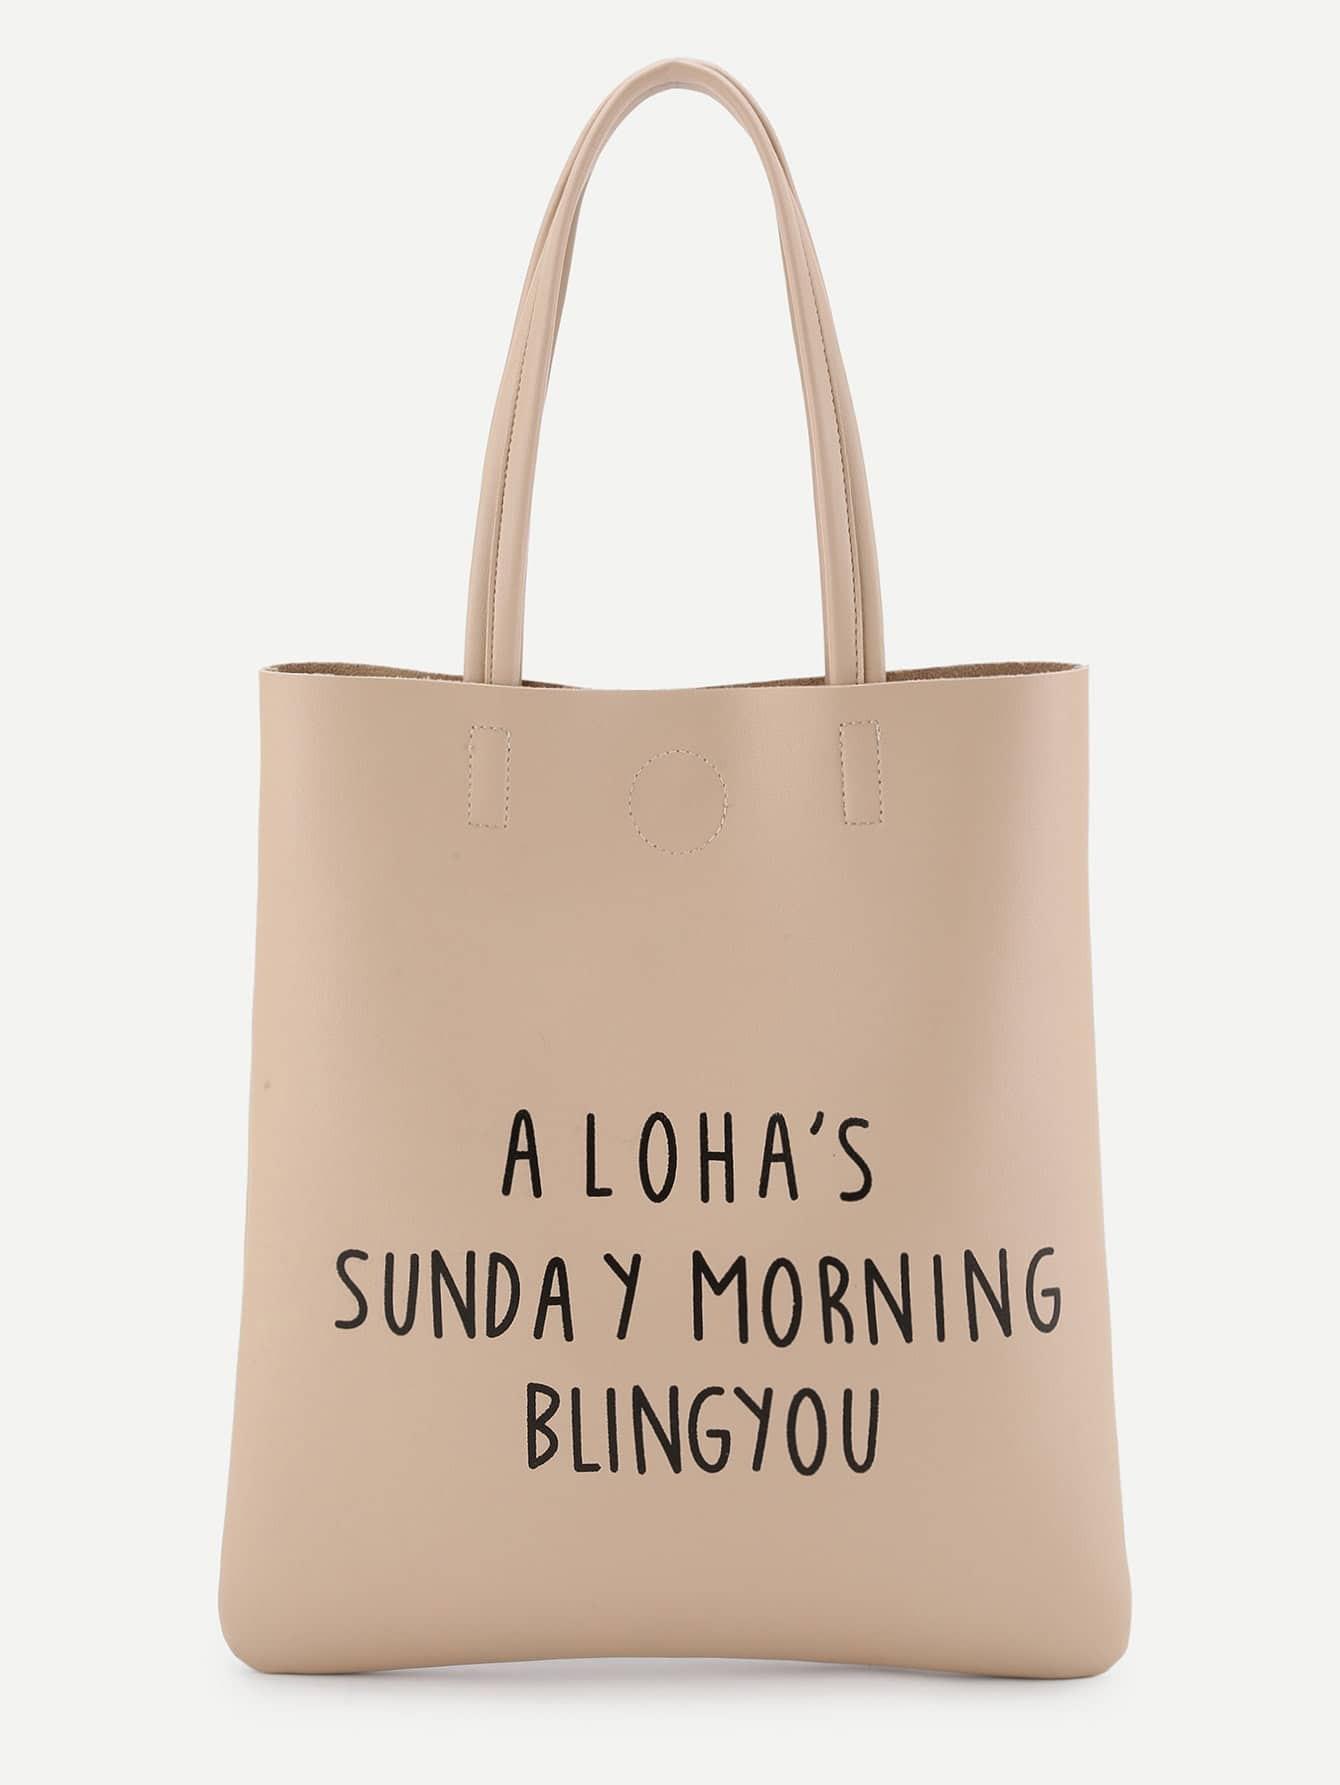 Slogan Print Minimalist Tote Bag куплю ваз 21112 трех дверную